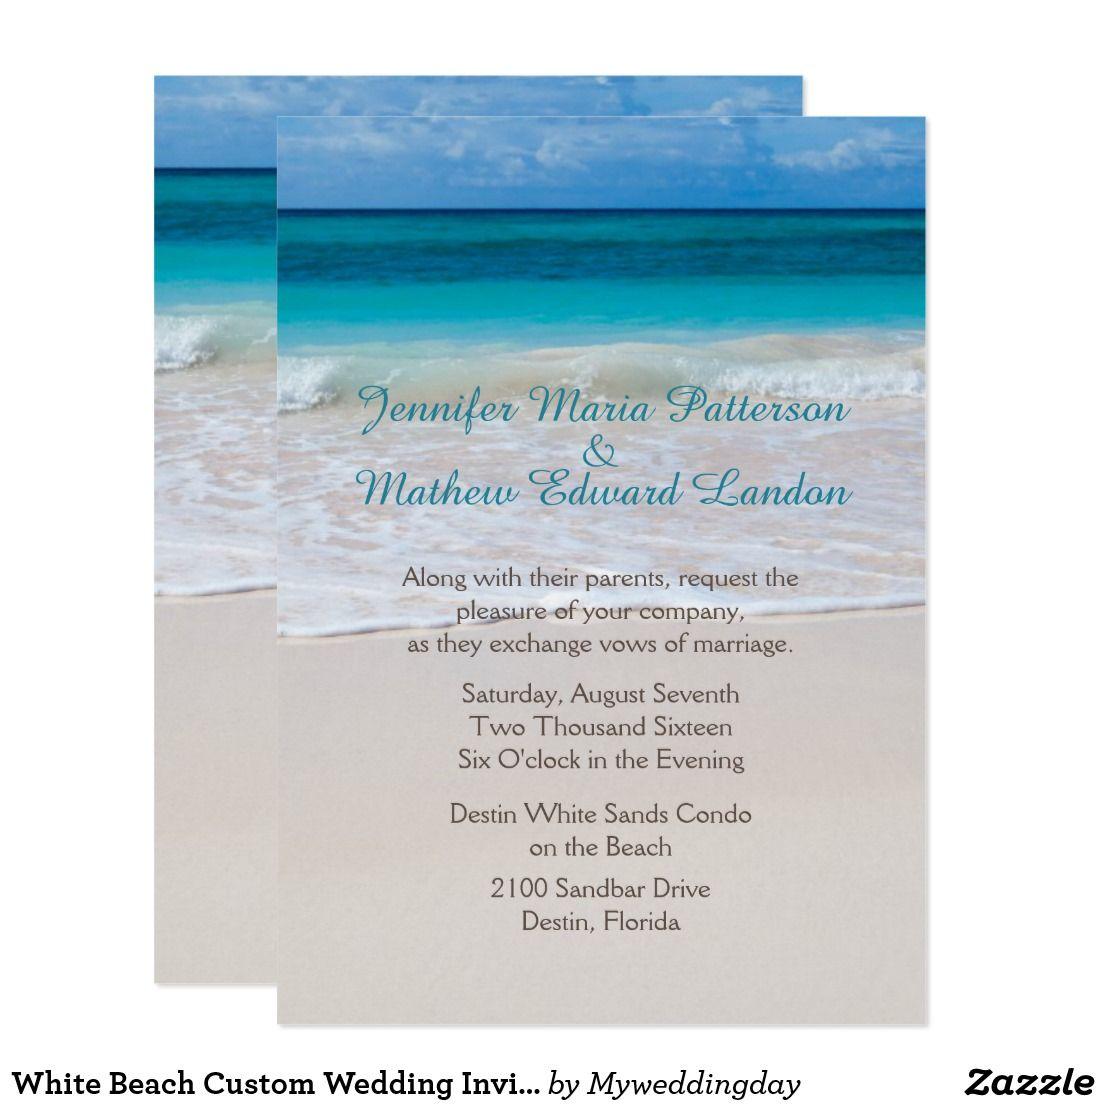 White Beach Custom Wedding Invitation | Vintage Wedding Invitations ...